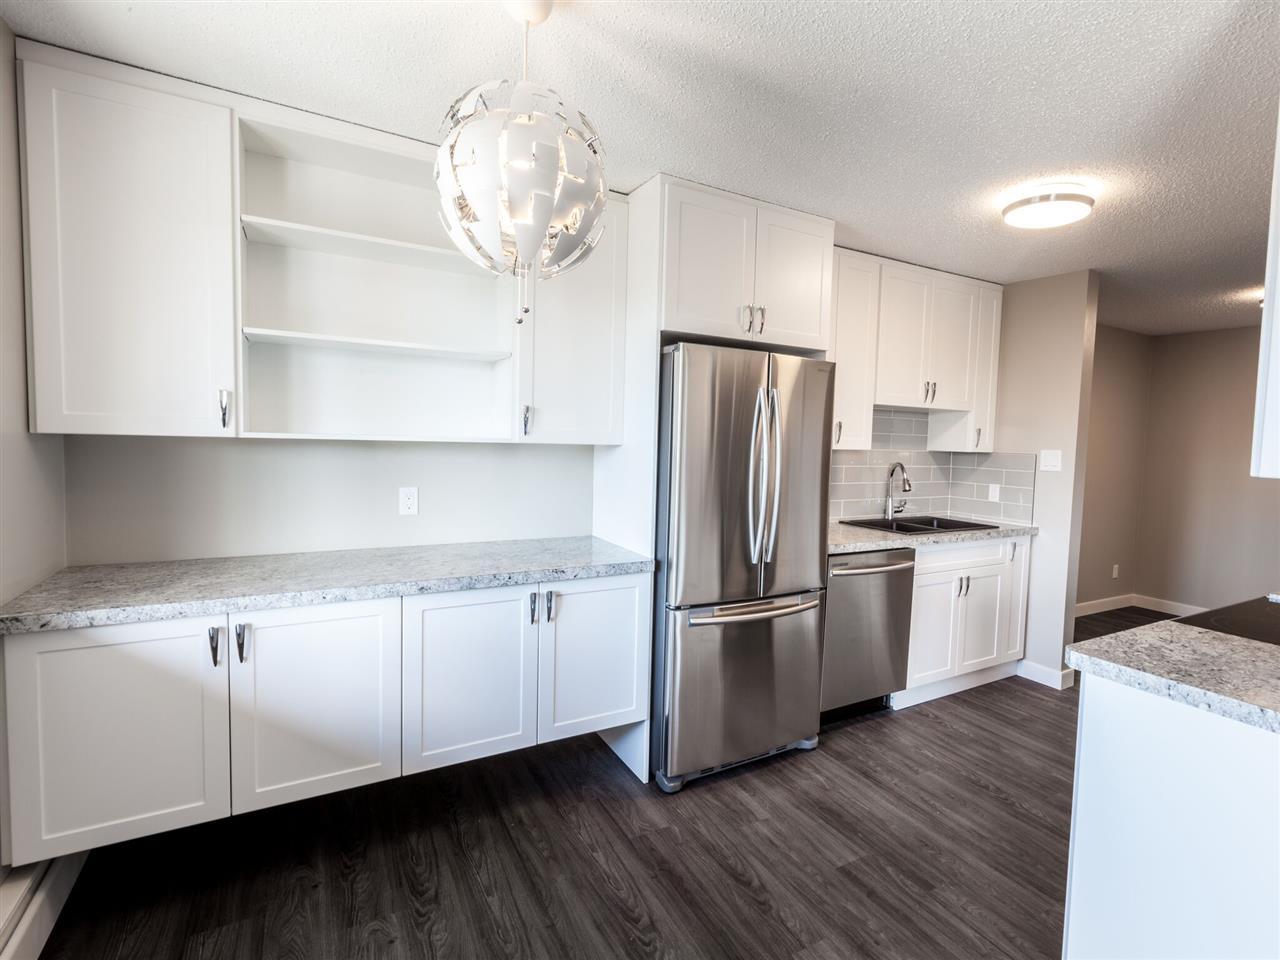 210 6103 35A Avenue NW, 2 bed, 1 bath, at $159,900